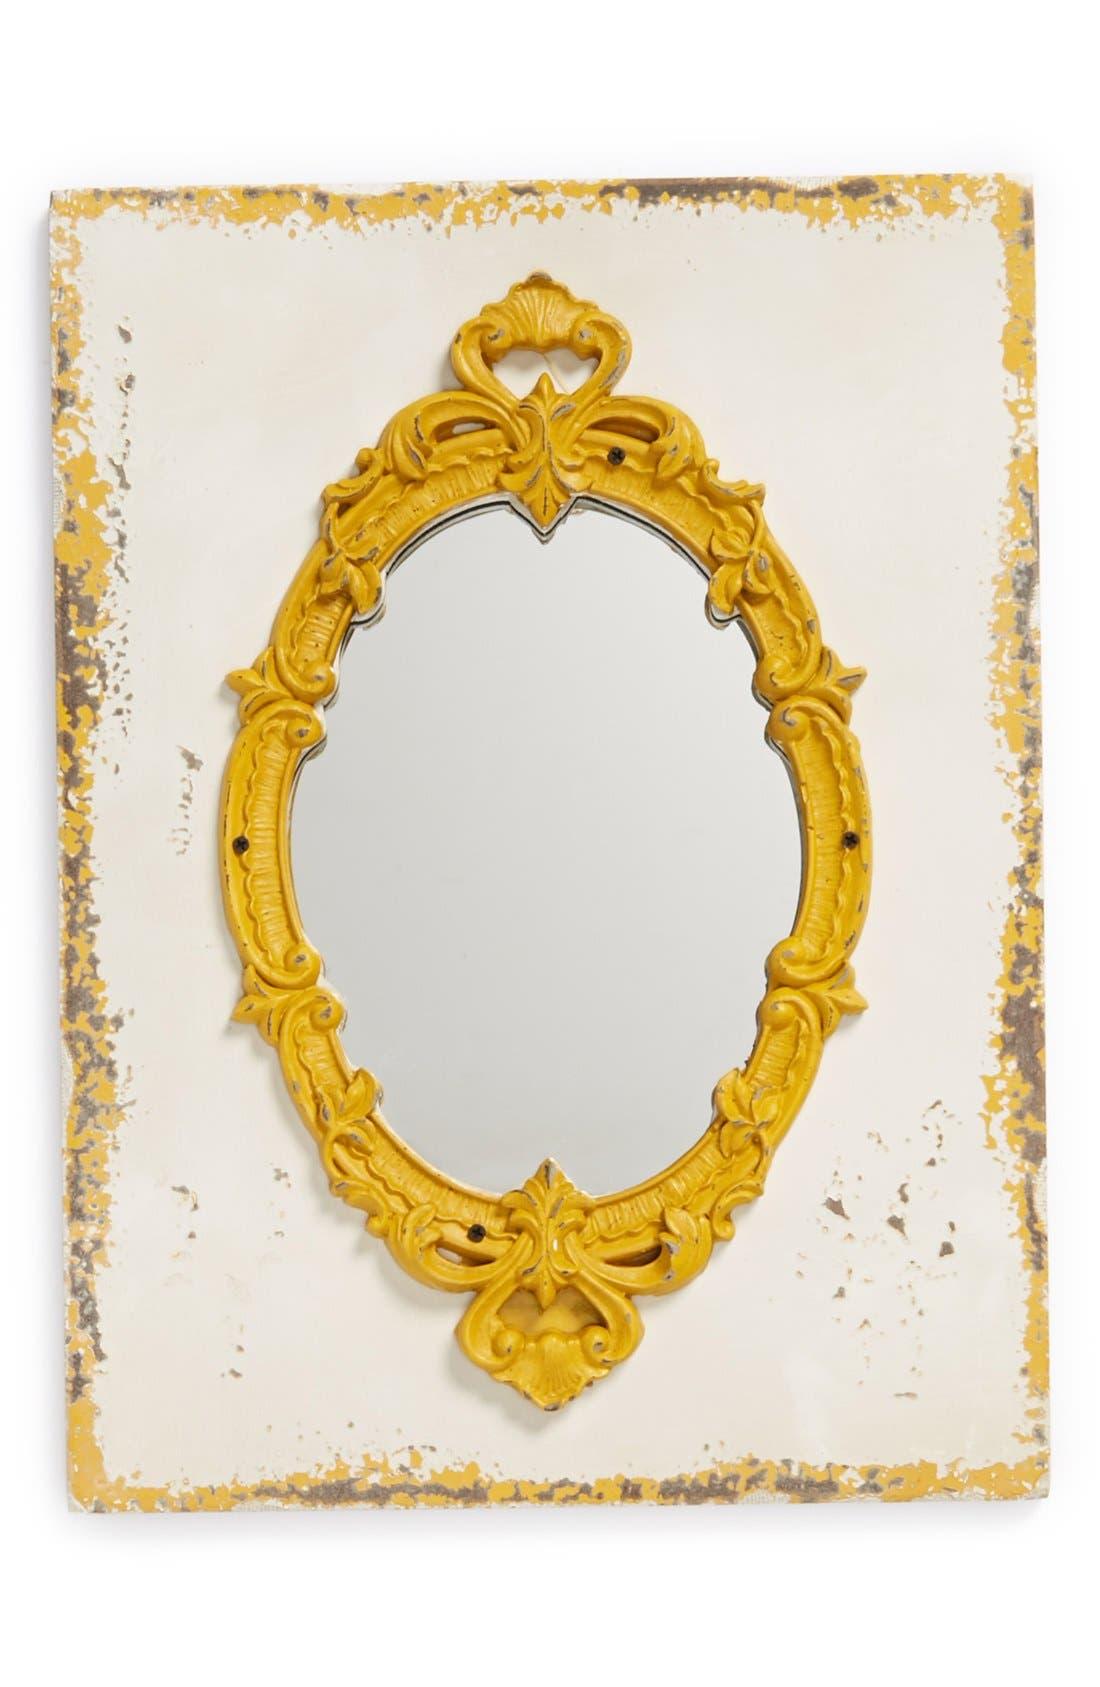 Alternate Image 1 Selected - VIP International Rustic Wood Mounted Mirror